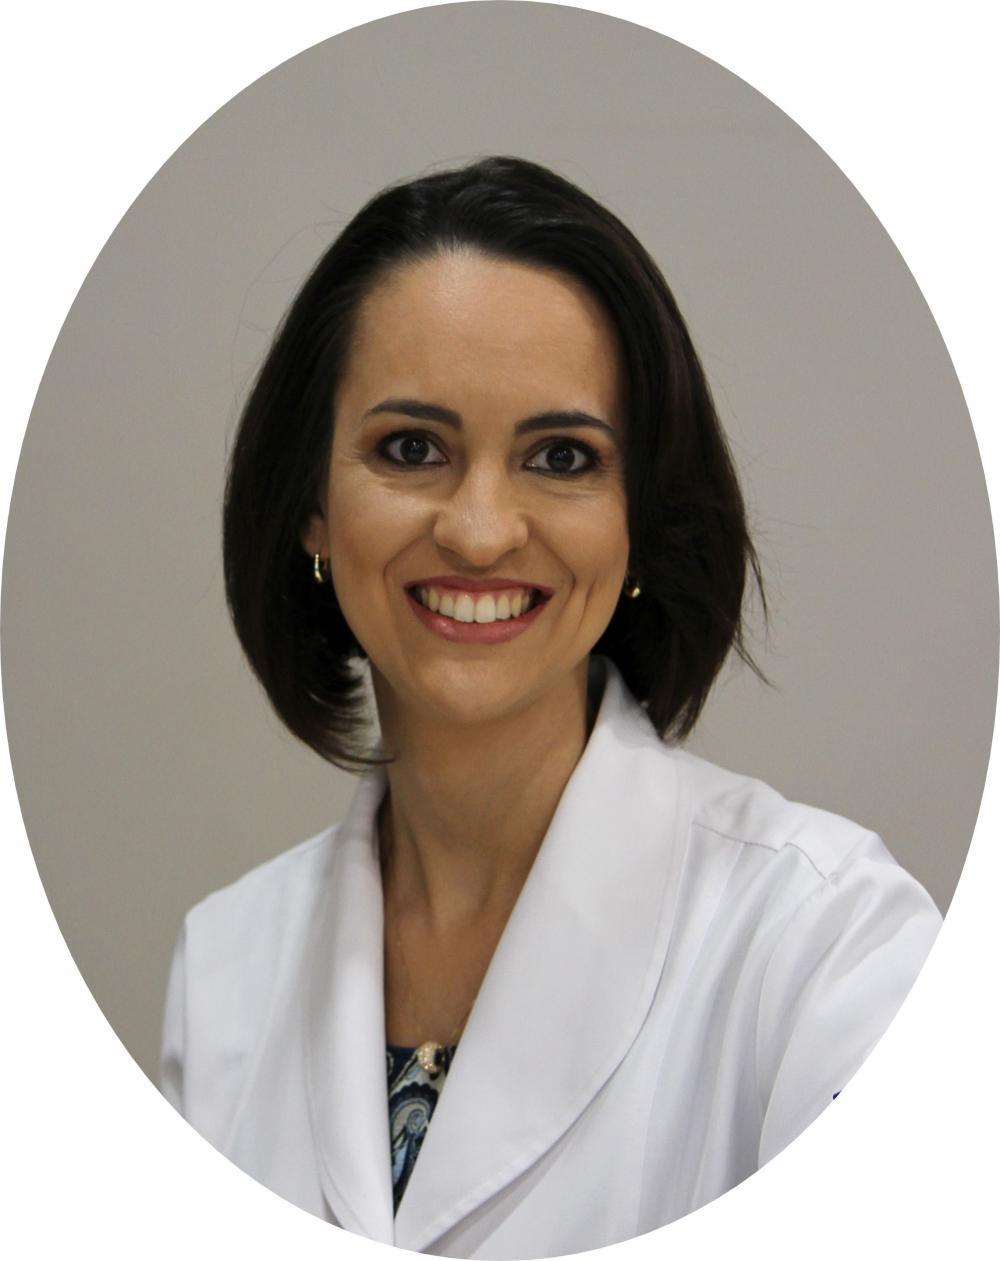 Dra. Aline Matos